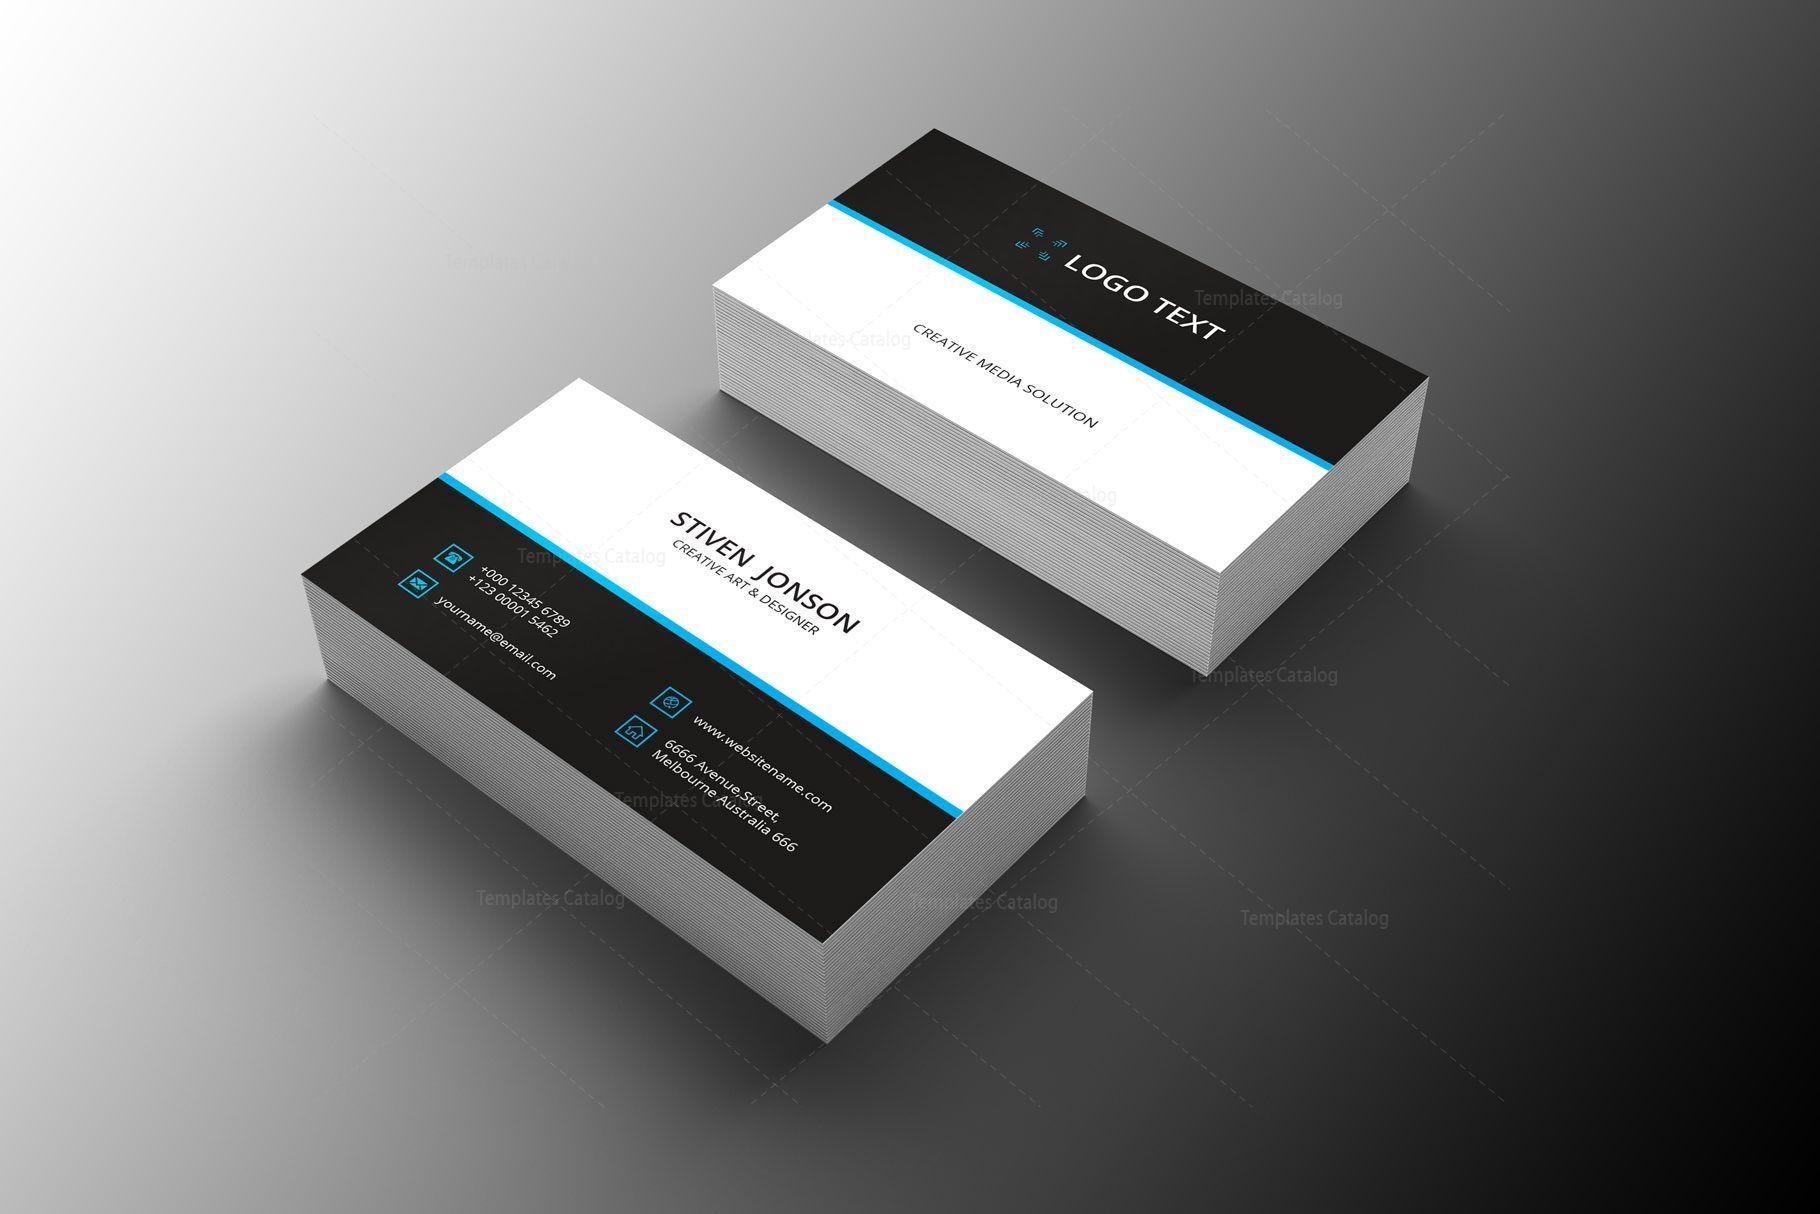 Distributor Professional Business Card Design Graphic Templates Professional Business Card Design Business Card Fonts Business Card Design